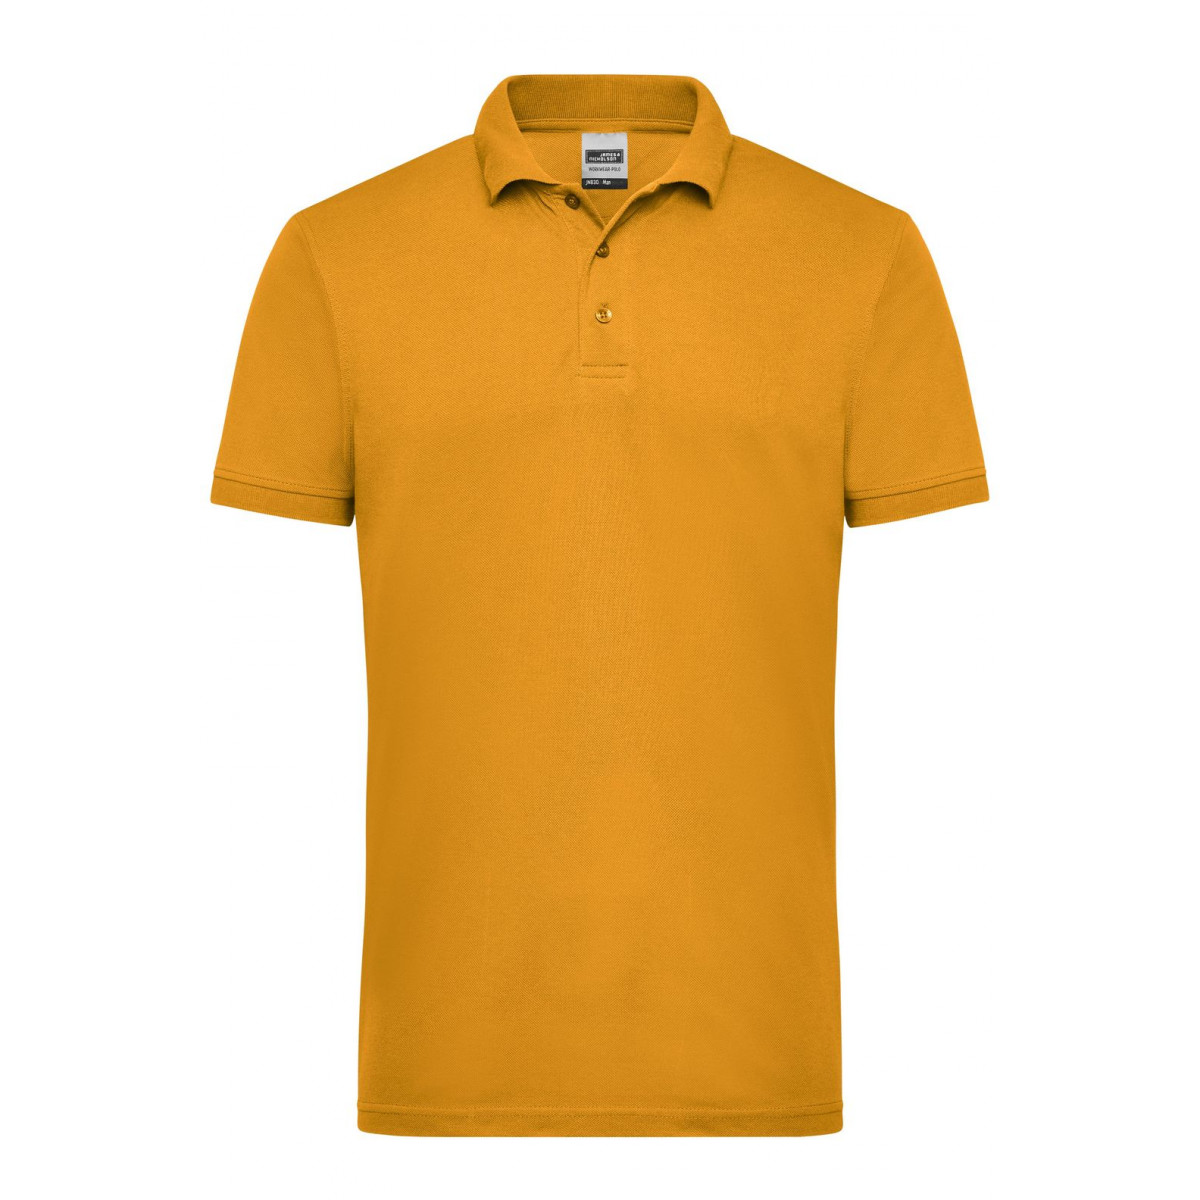 Рубашка поло мужская JN830 Mens Workwear Polo - Золоистый желтый